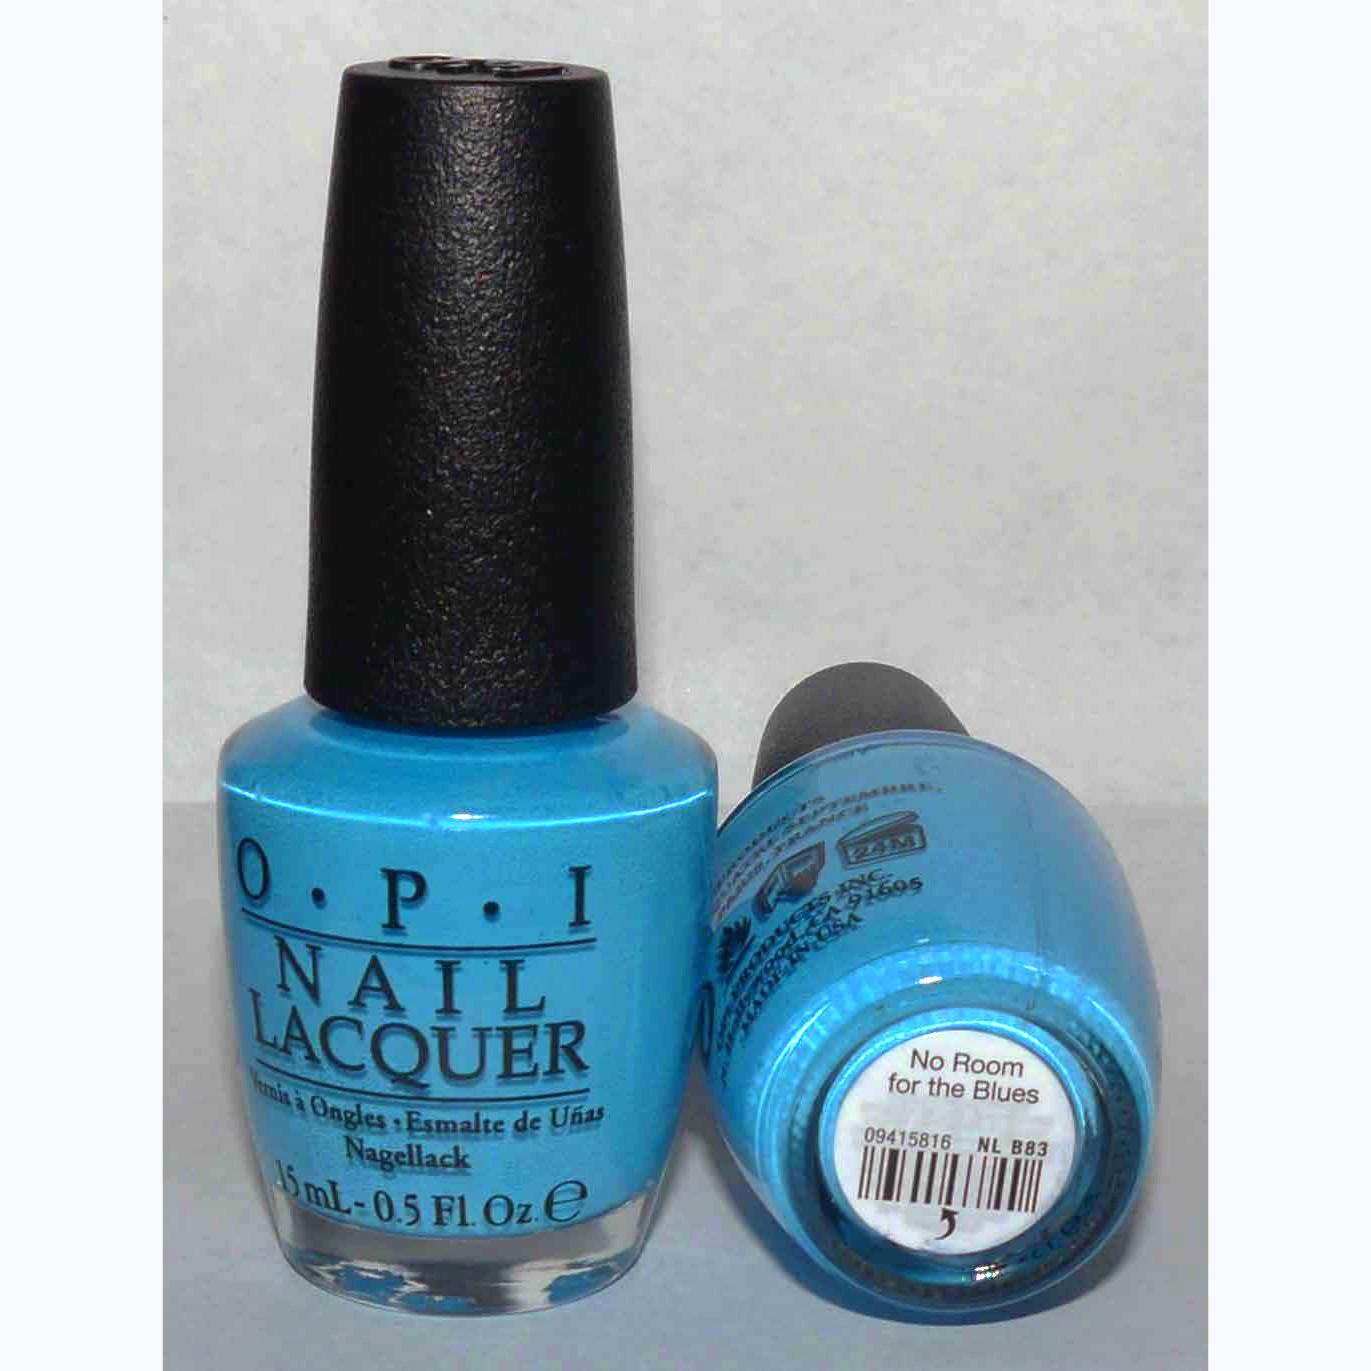 No Room for the Blues - OPI Nail Polish Lacquer 0.5 oz